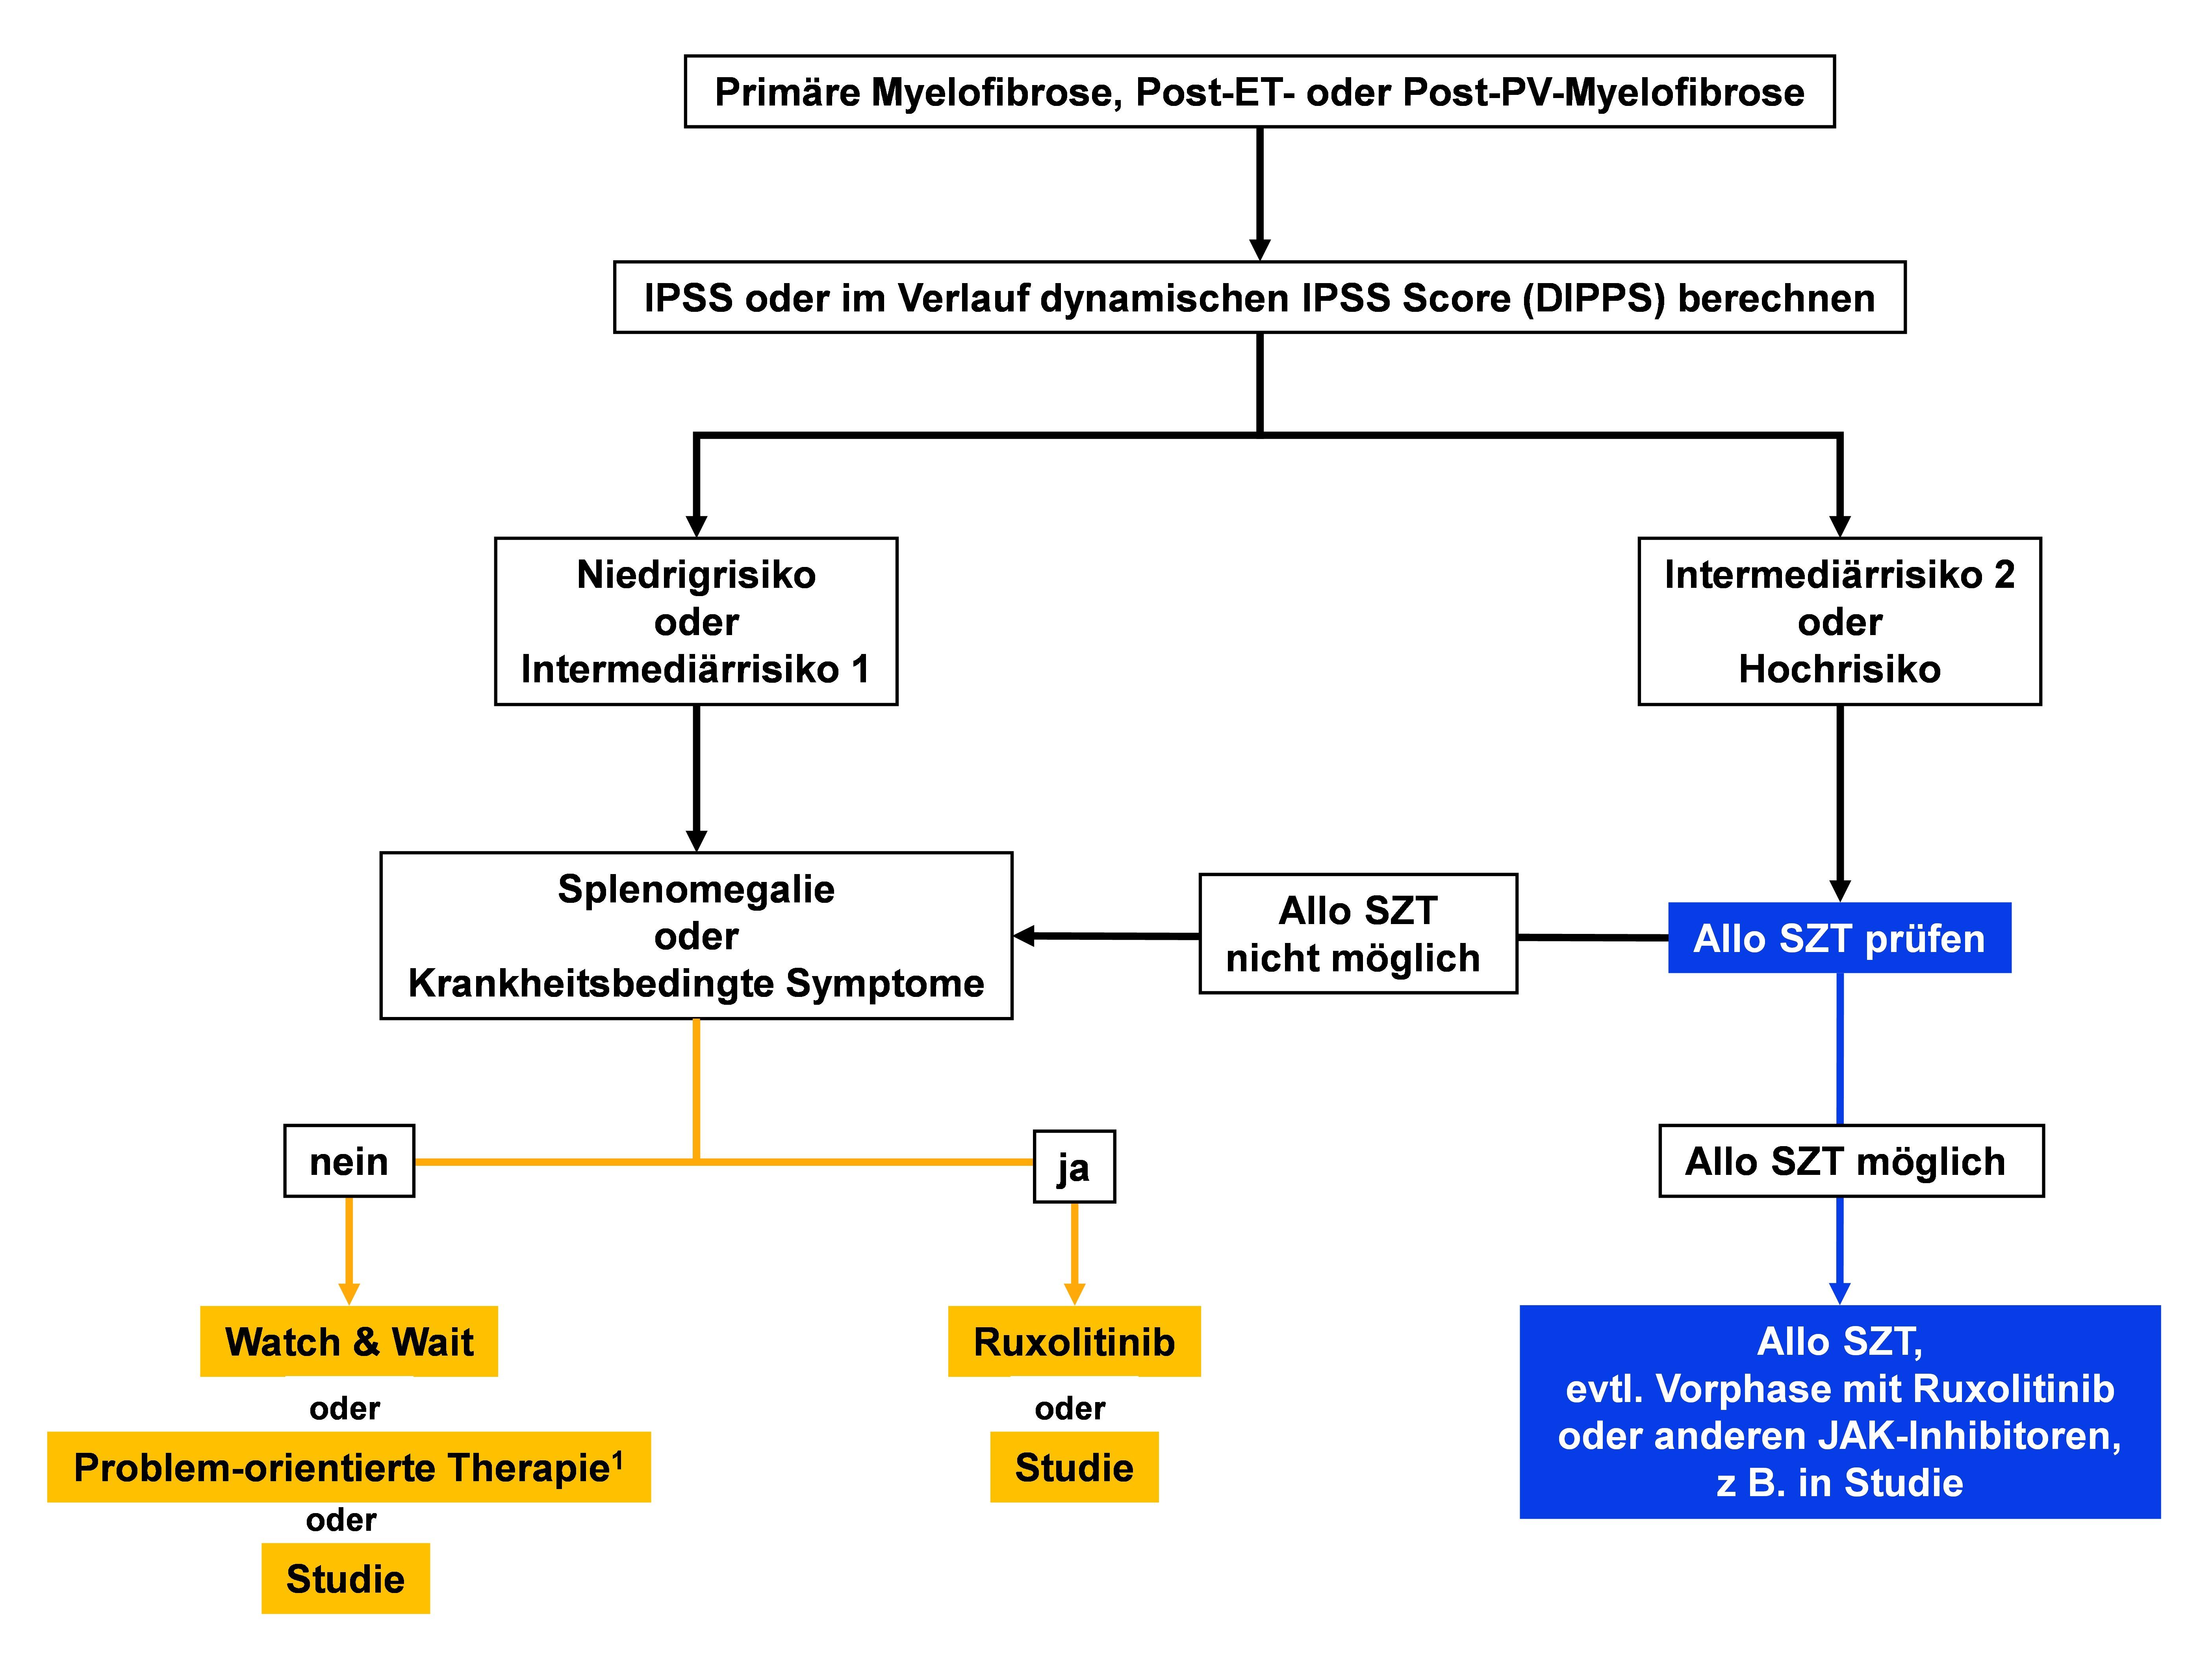 Therapiestruktur von Primärer Myelofibrose (PMF), Post-ET- oder Post-PV-Myelofibrose